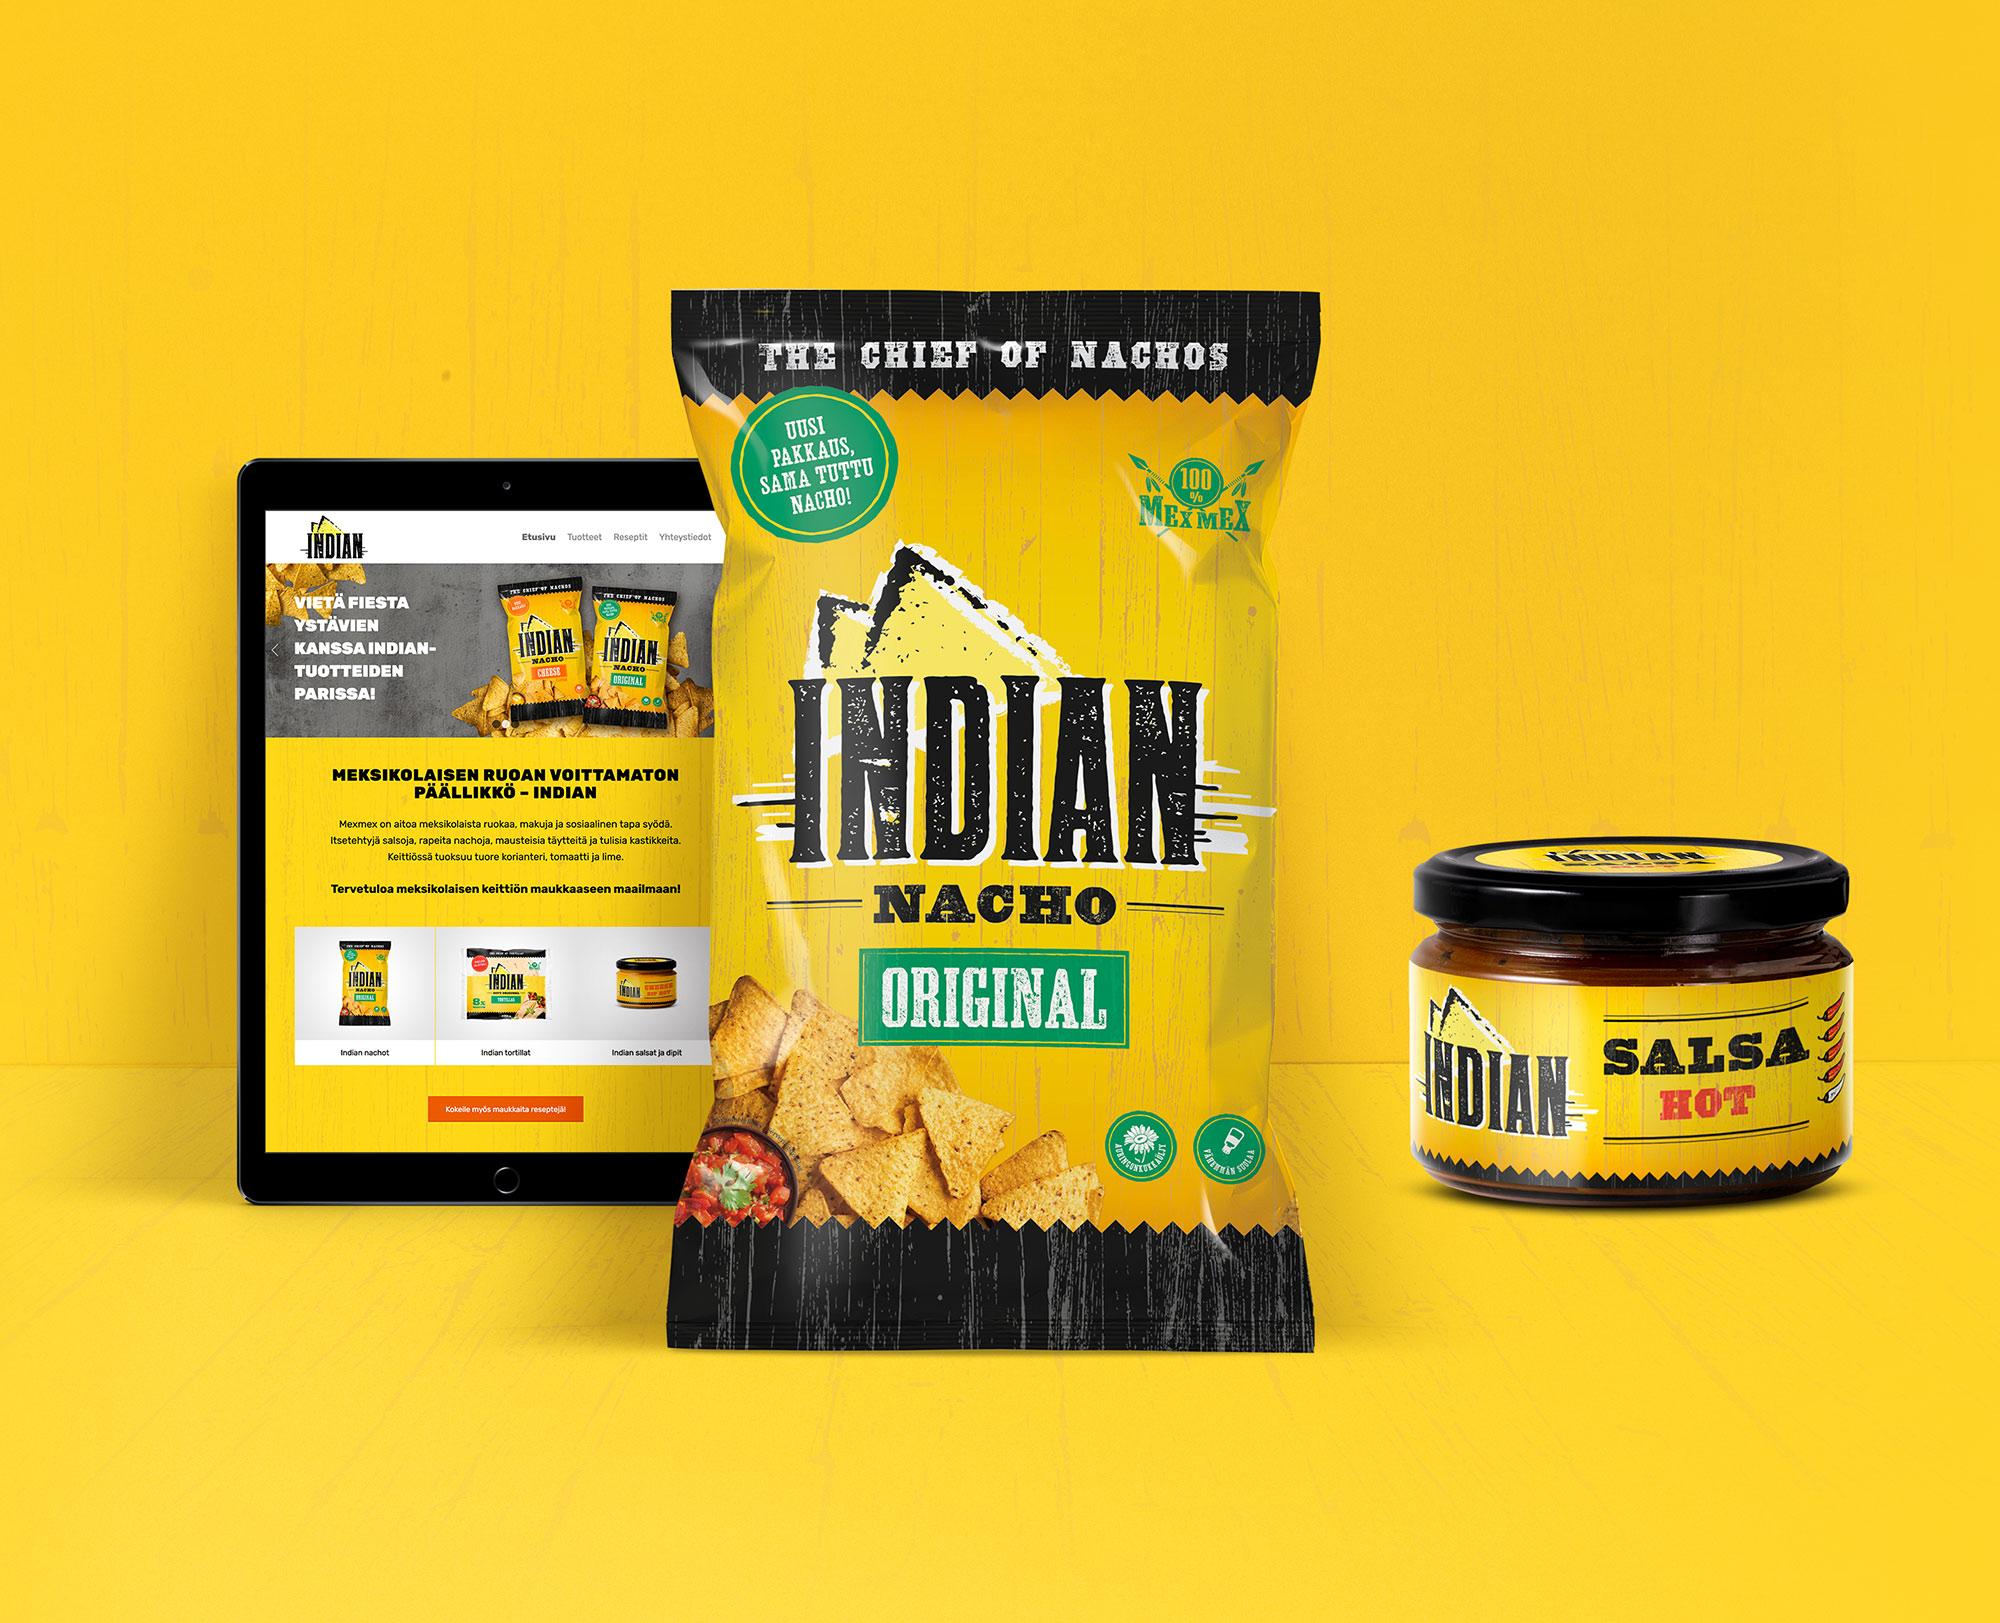 Case: Indian